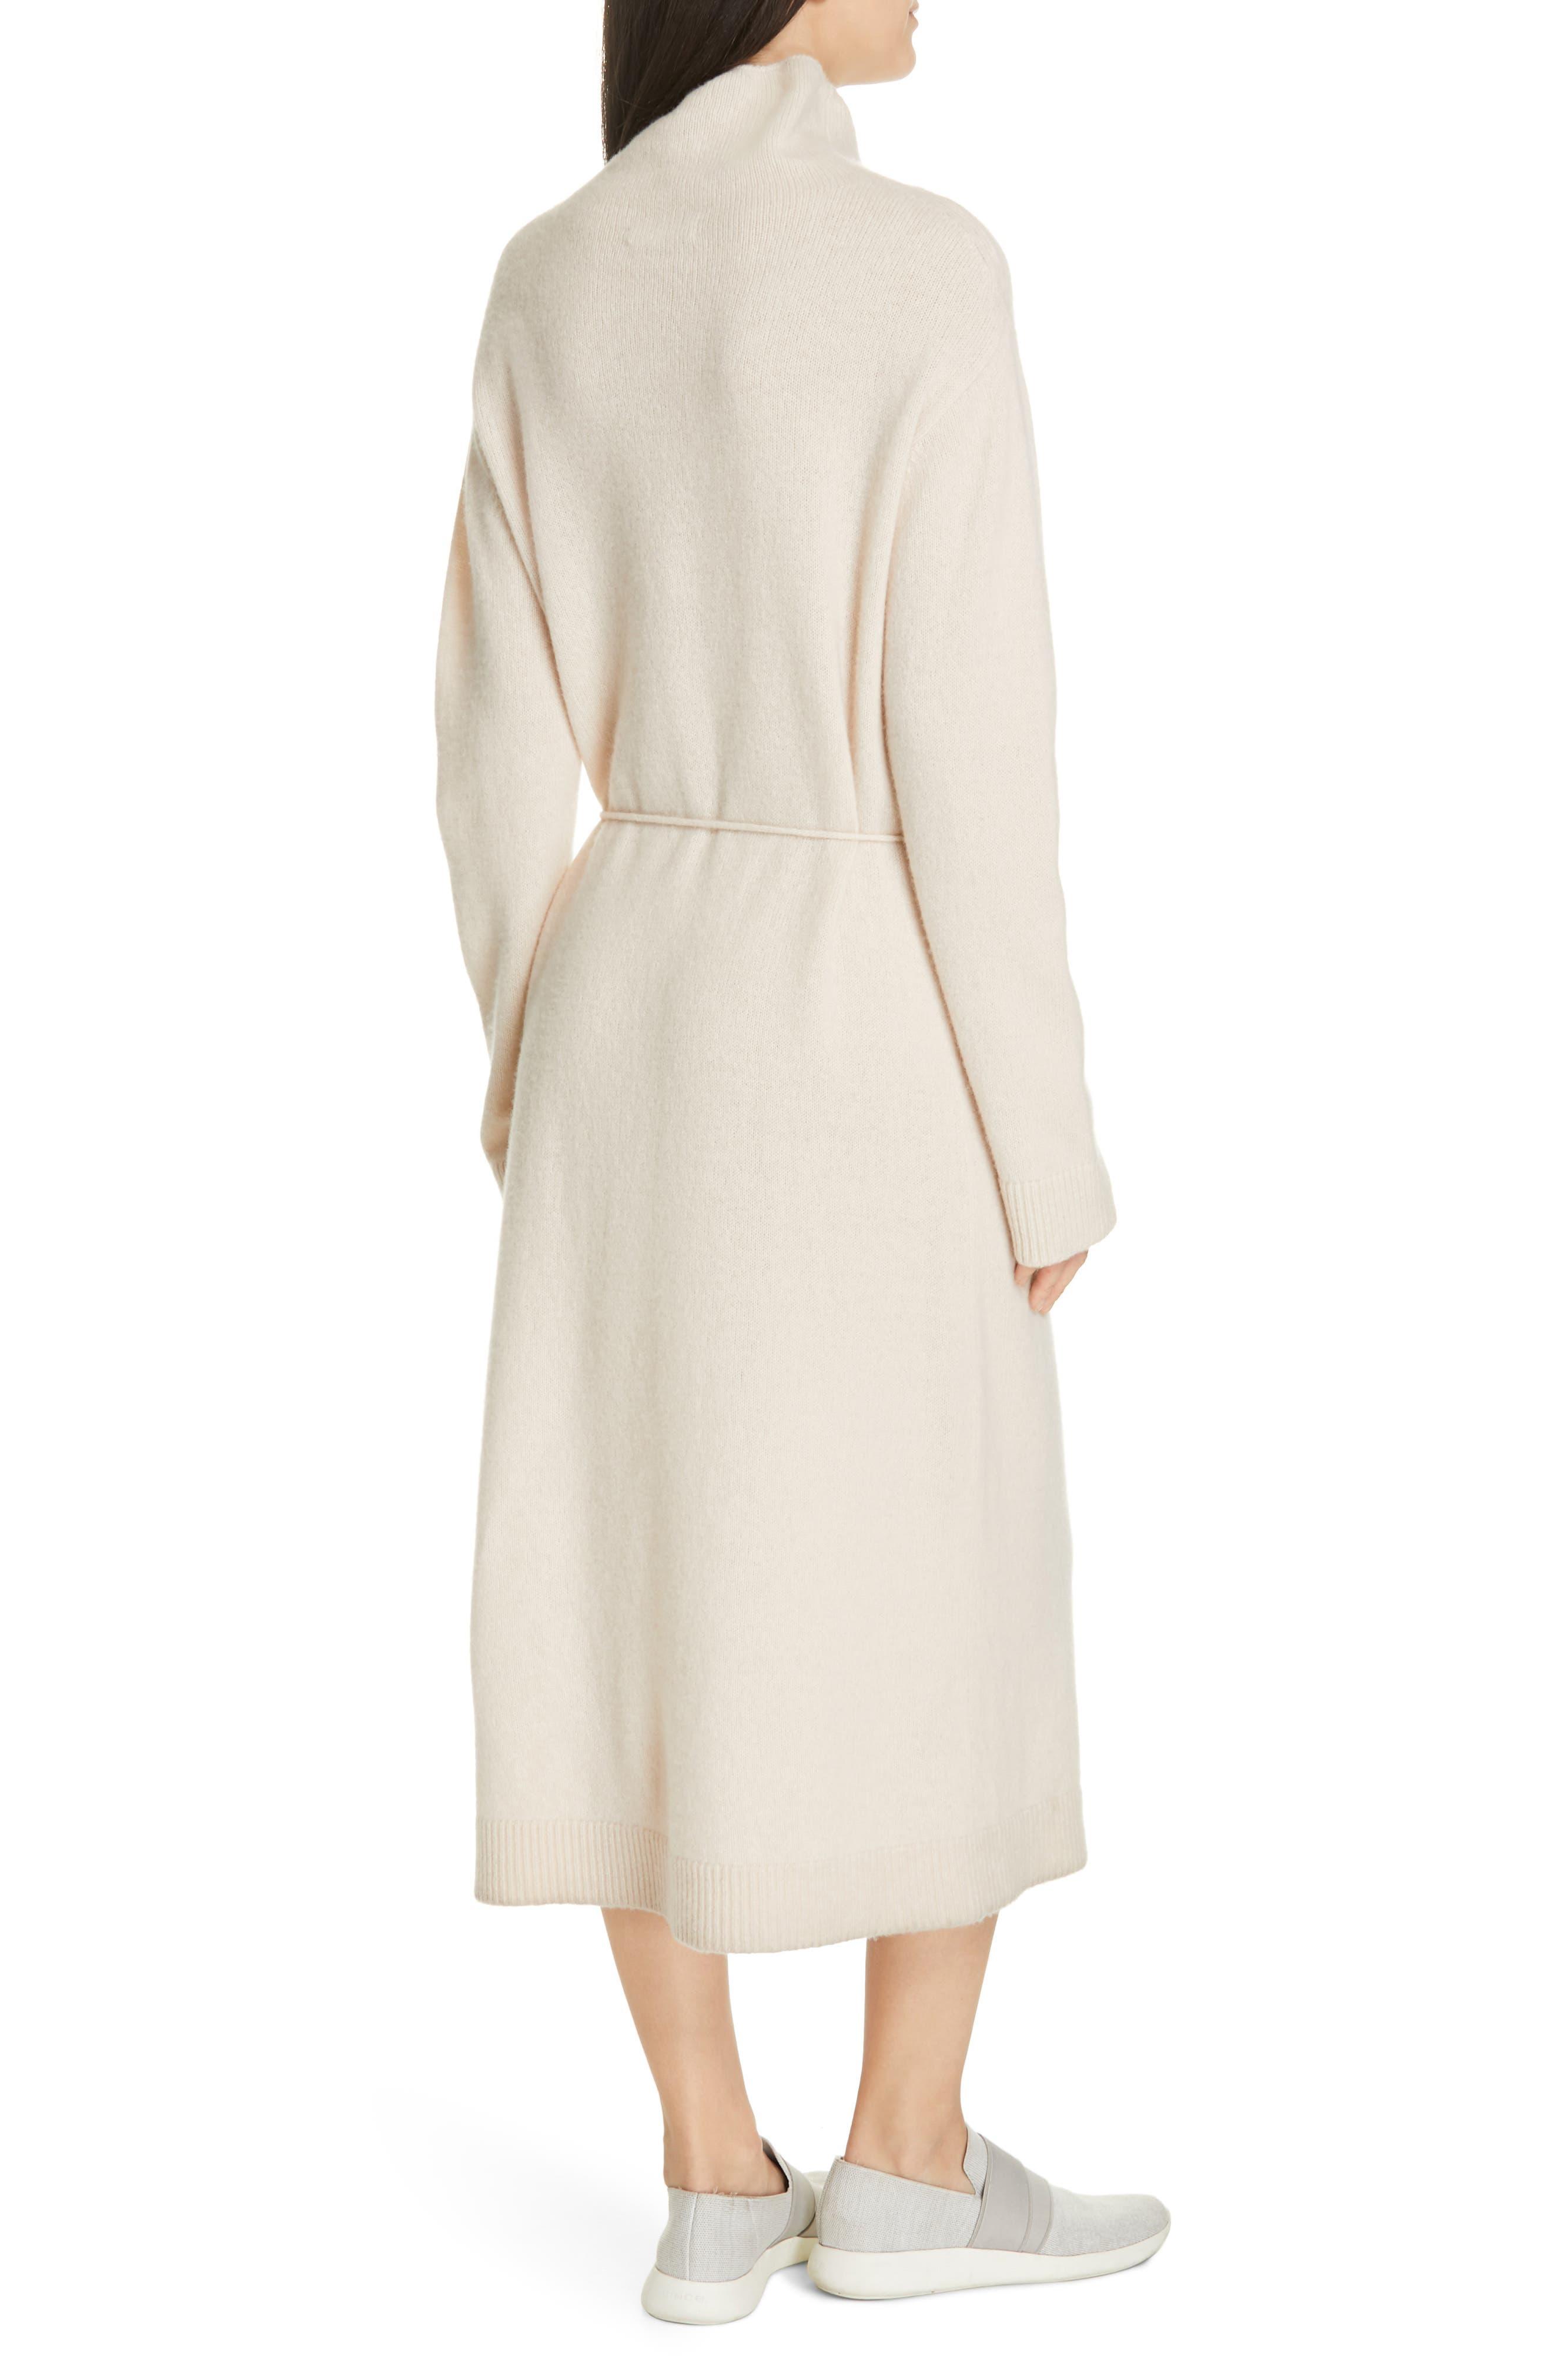 VINCE,                             Funnel Neck Wool & Cashmere Sweater Dress,                             Alternate thumbnail 2, color,                             BLUSH